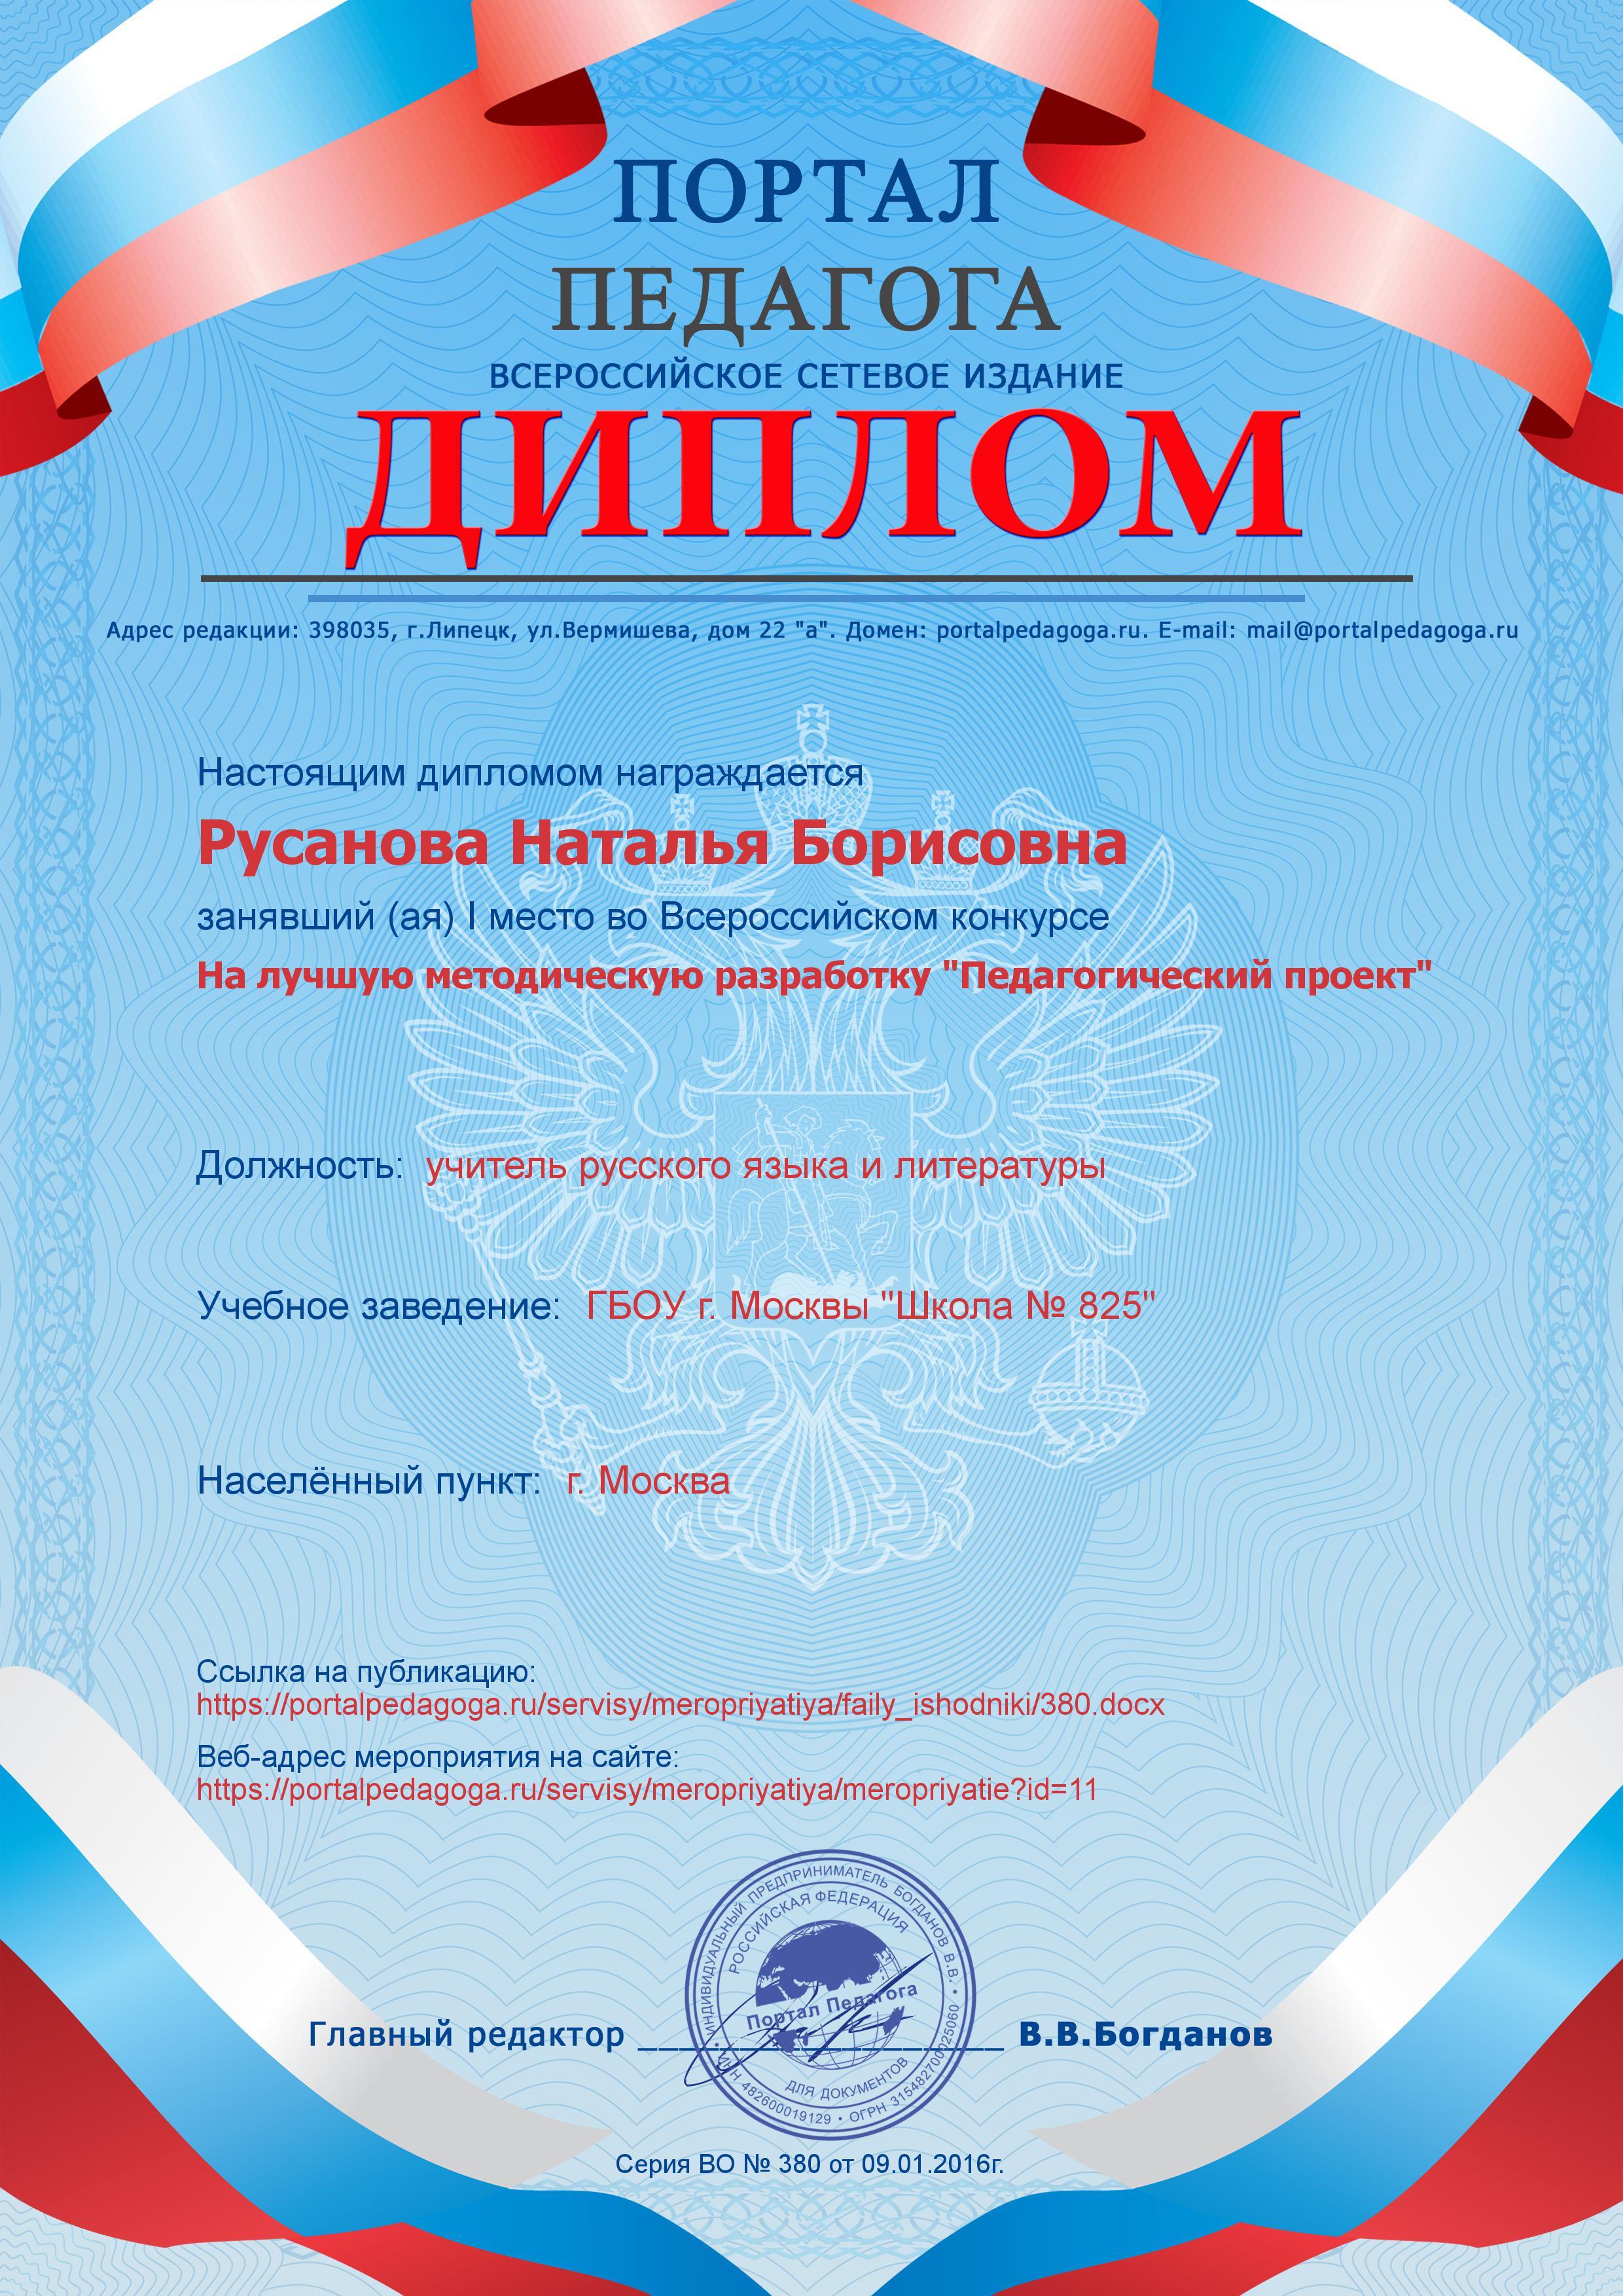 Diplom-portal-pedagoga-2016-2